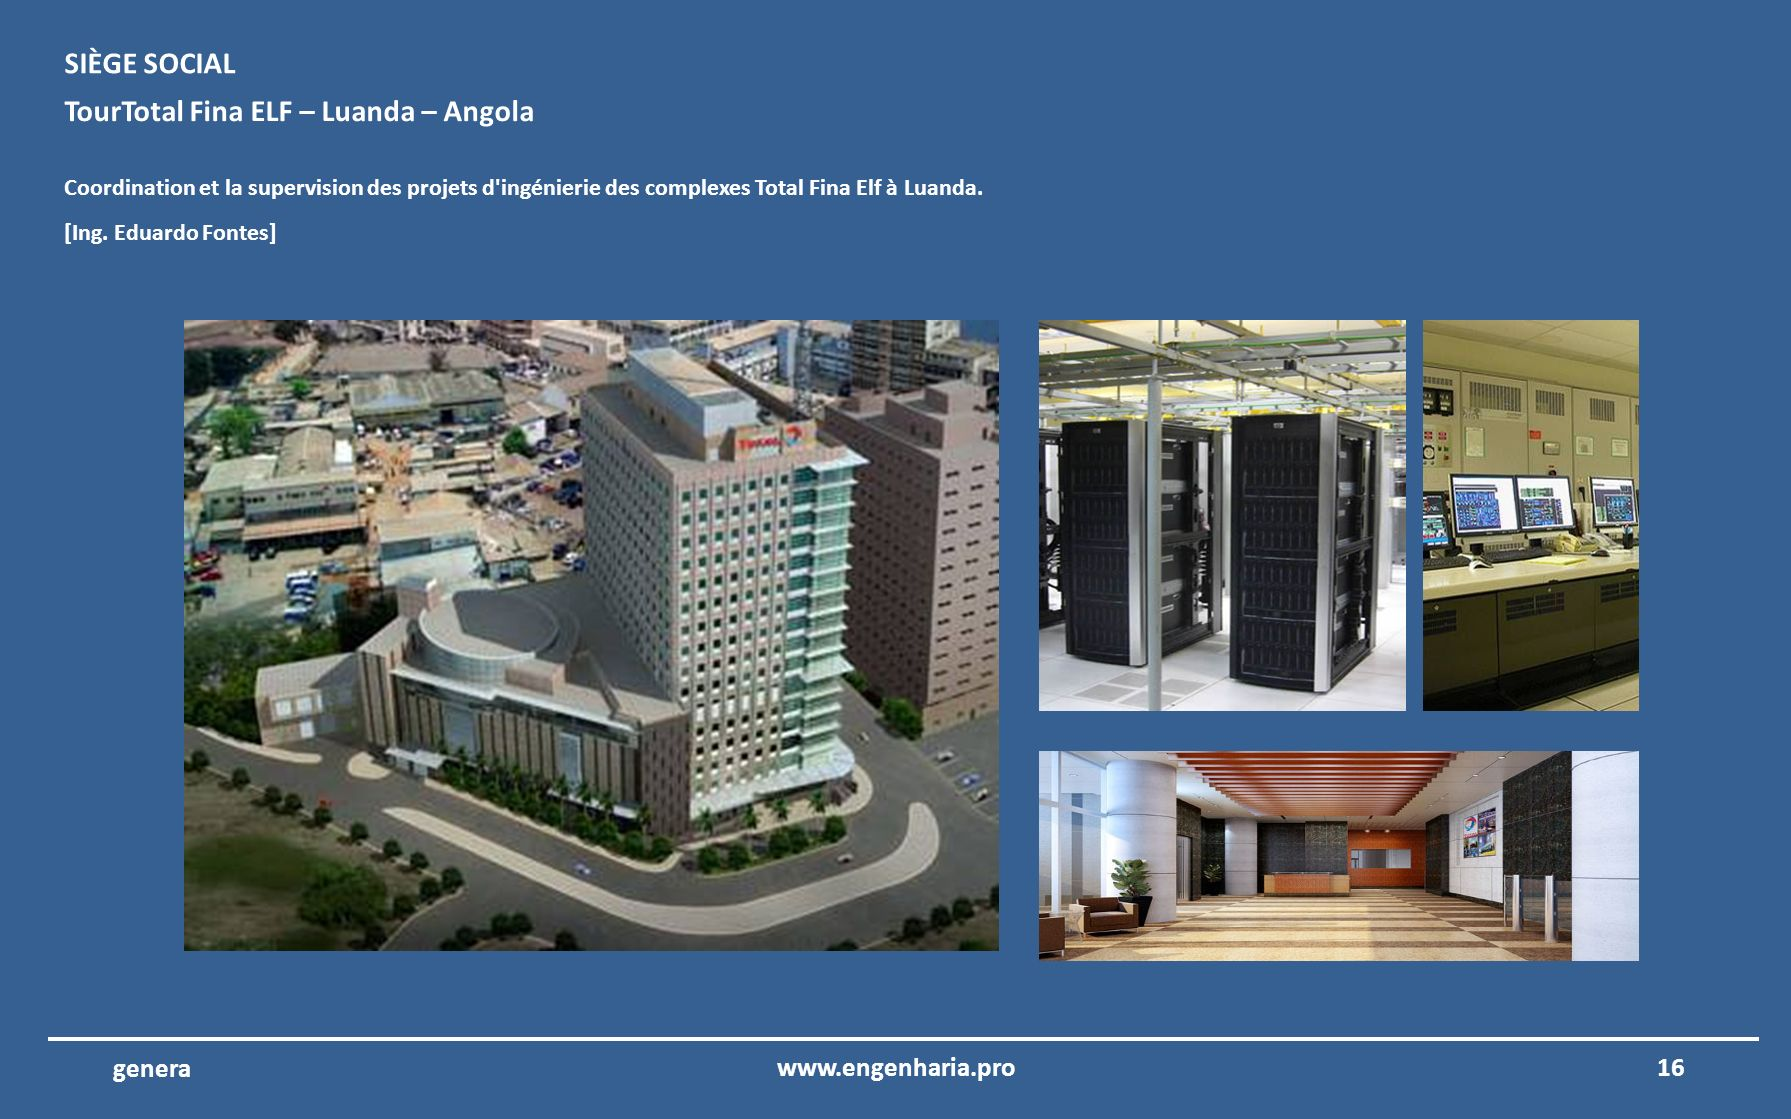 TourTotal Fina ELF – Luanda – Angola